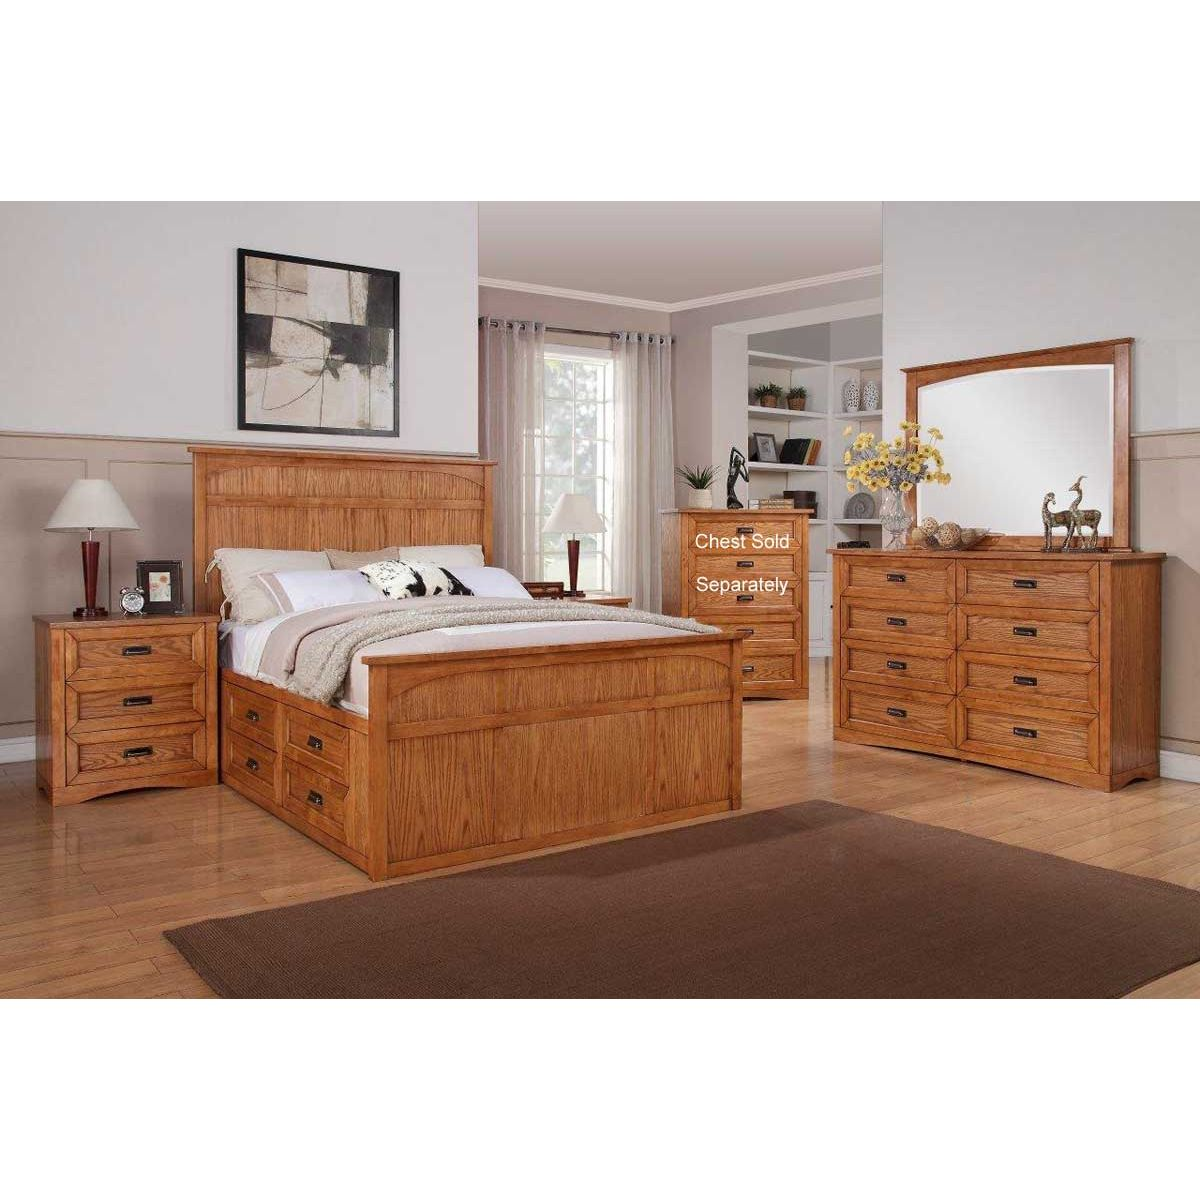 7 piece bedroom furniture sets photo - 6